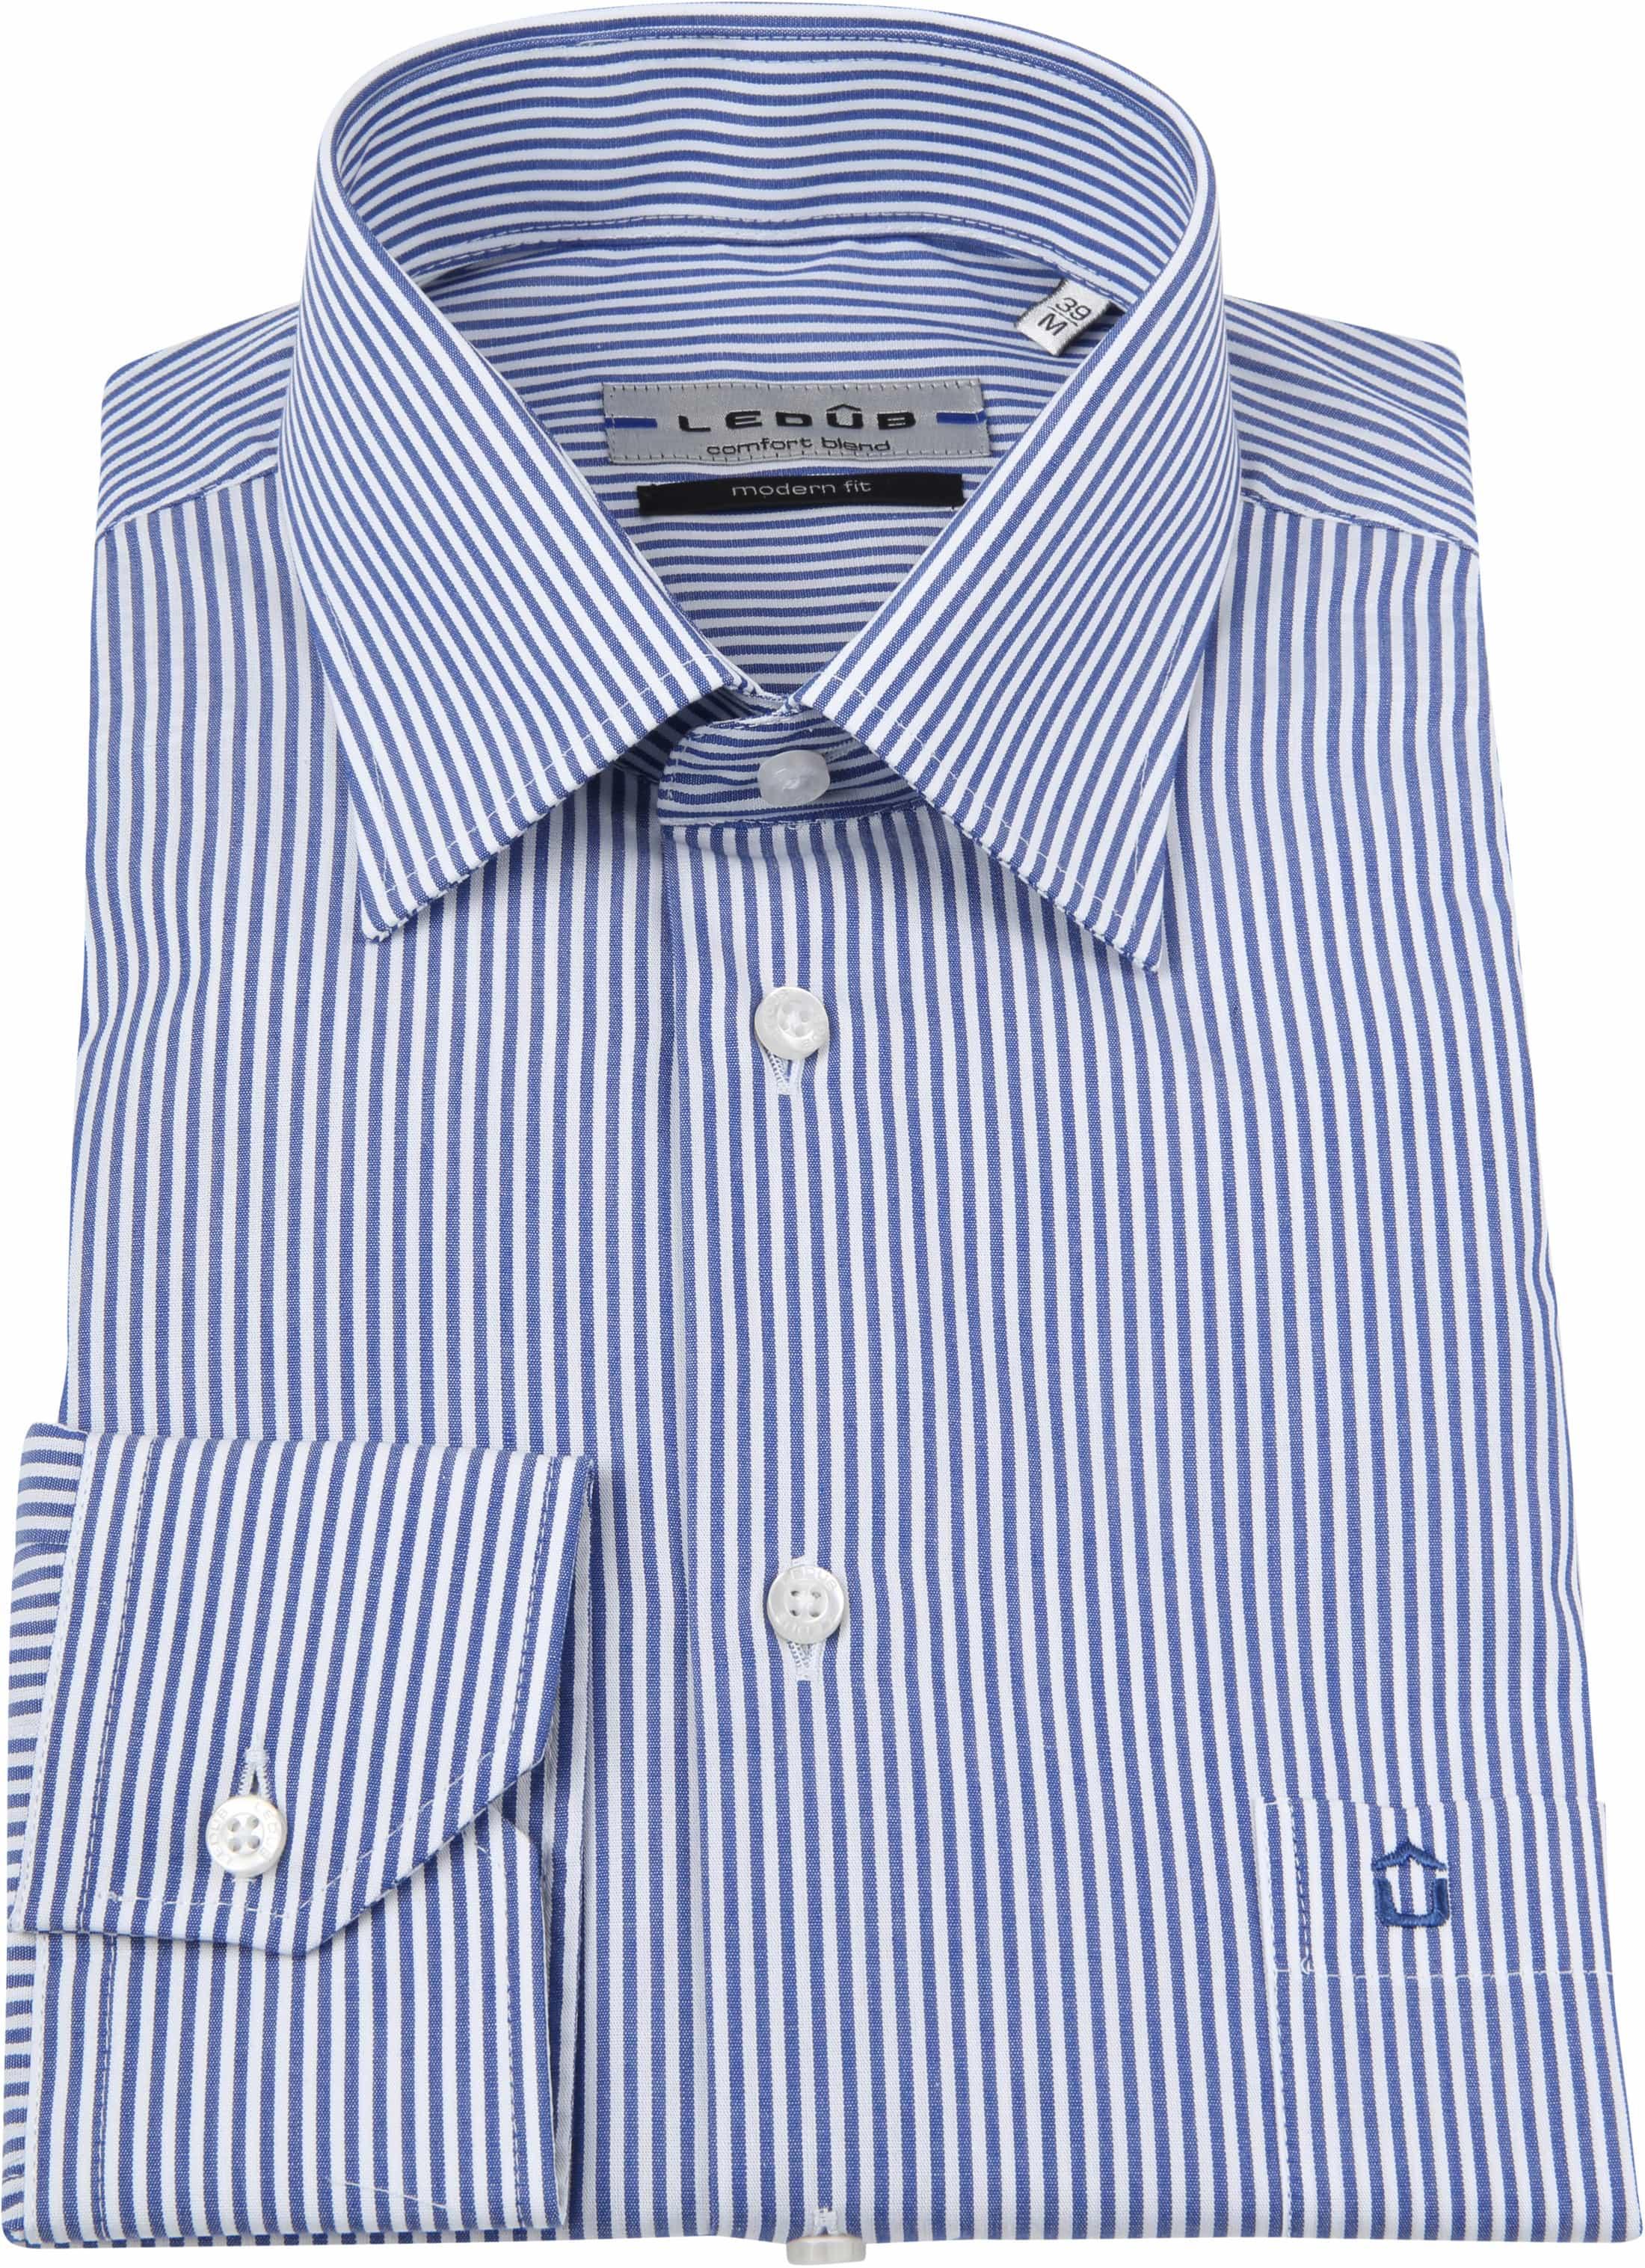 Ledub Overhemd MF Striped Blue